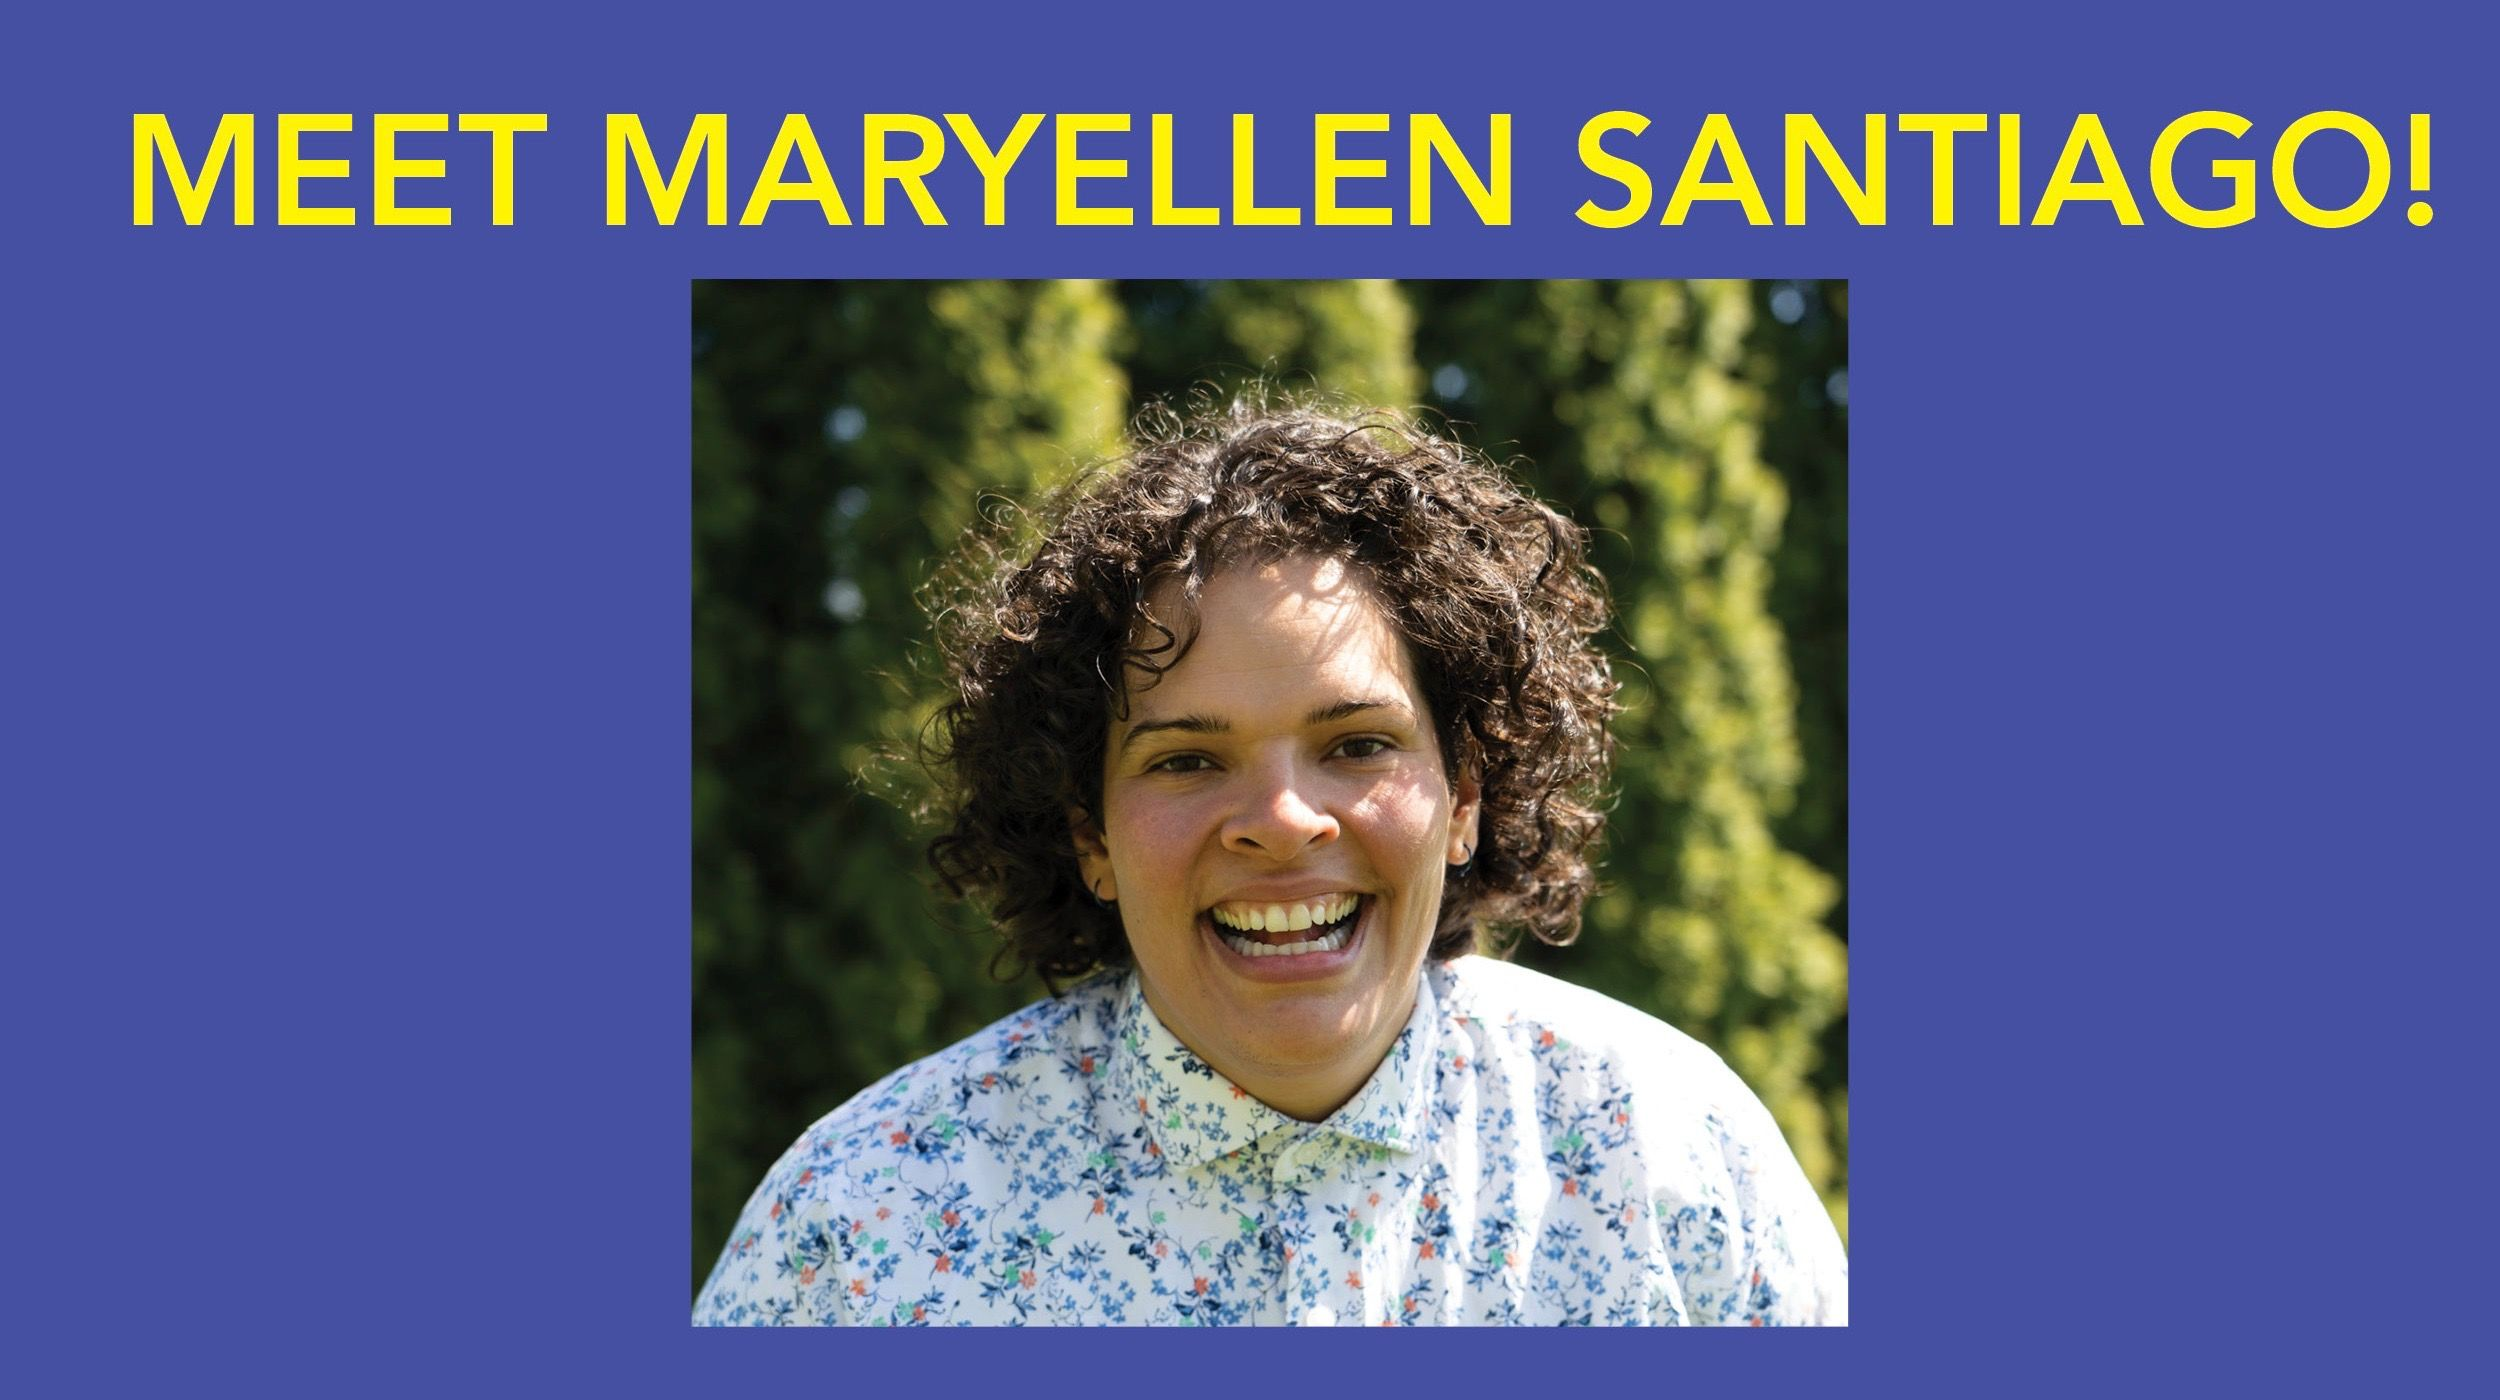 Meet Maryellen Santiago